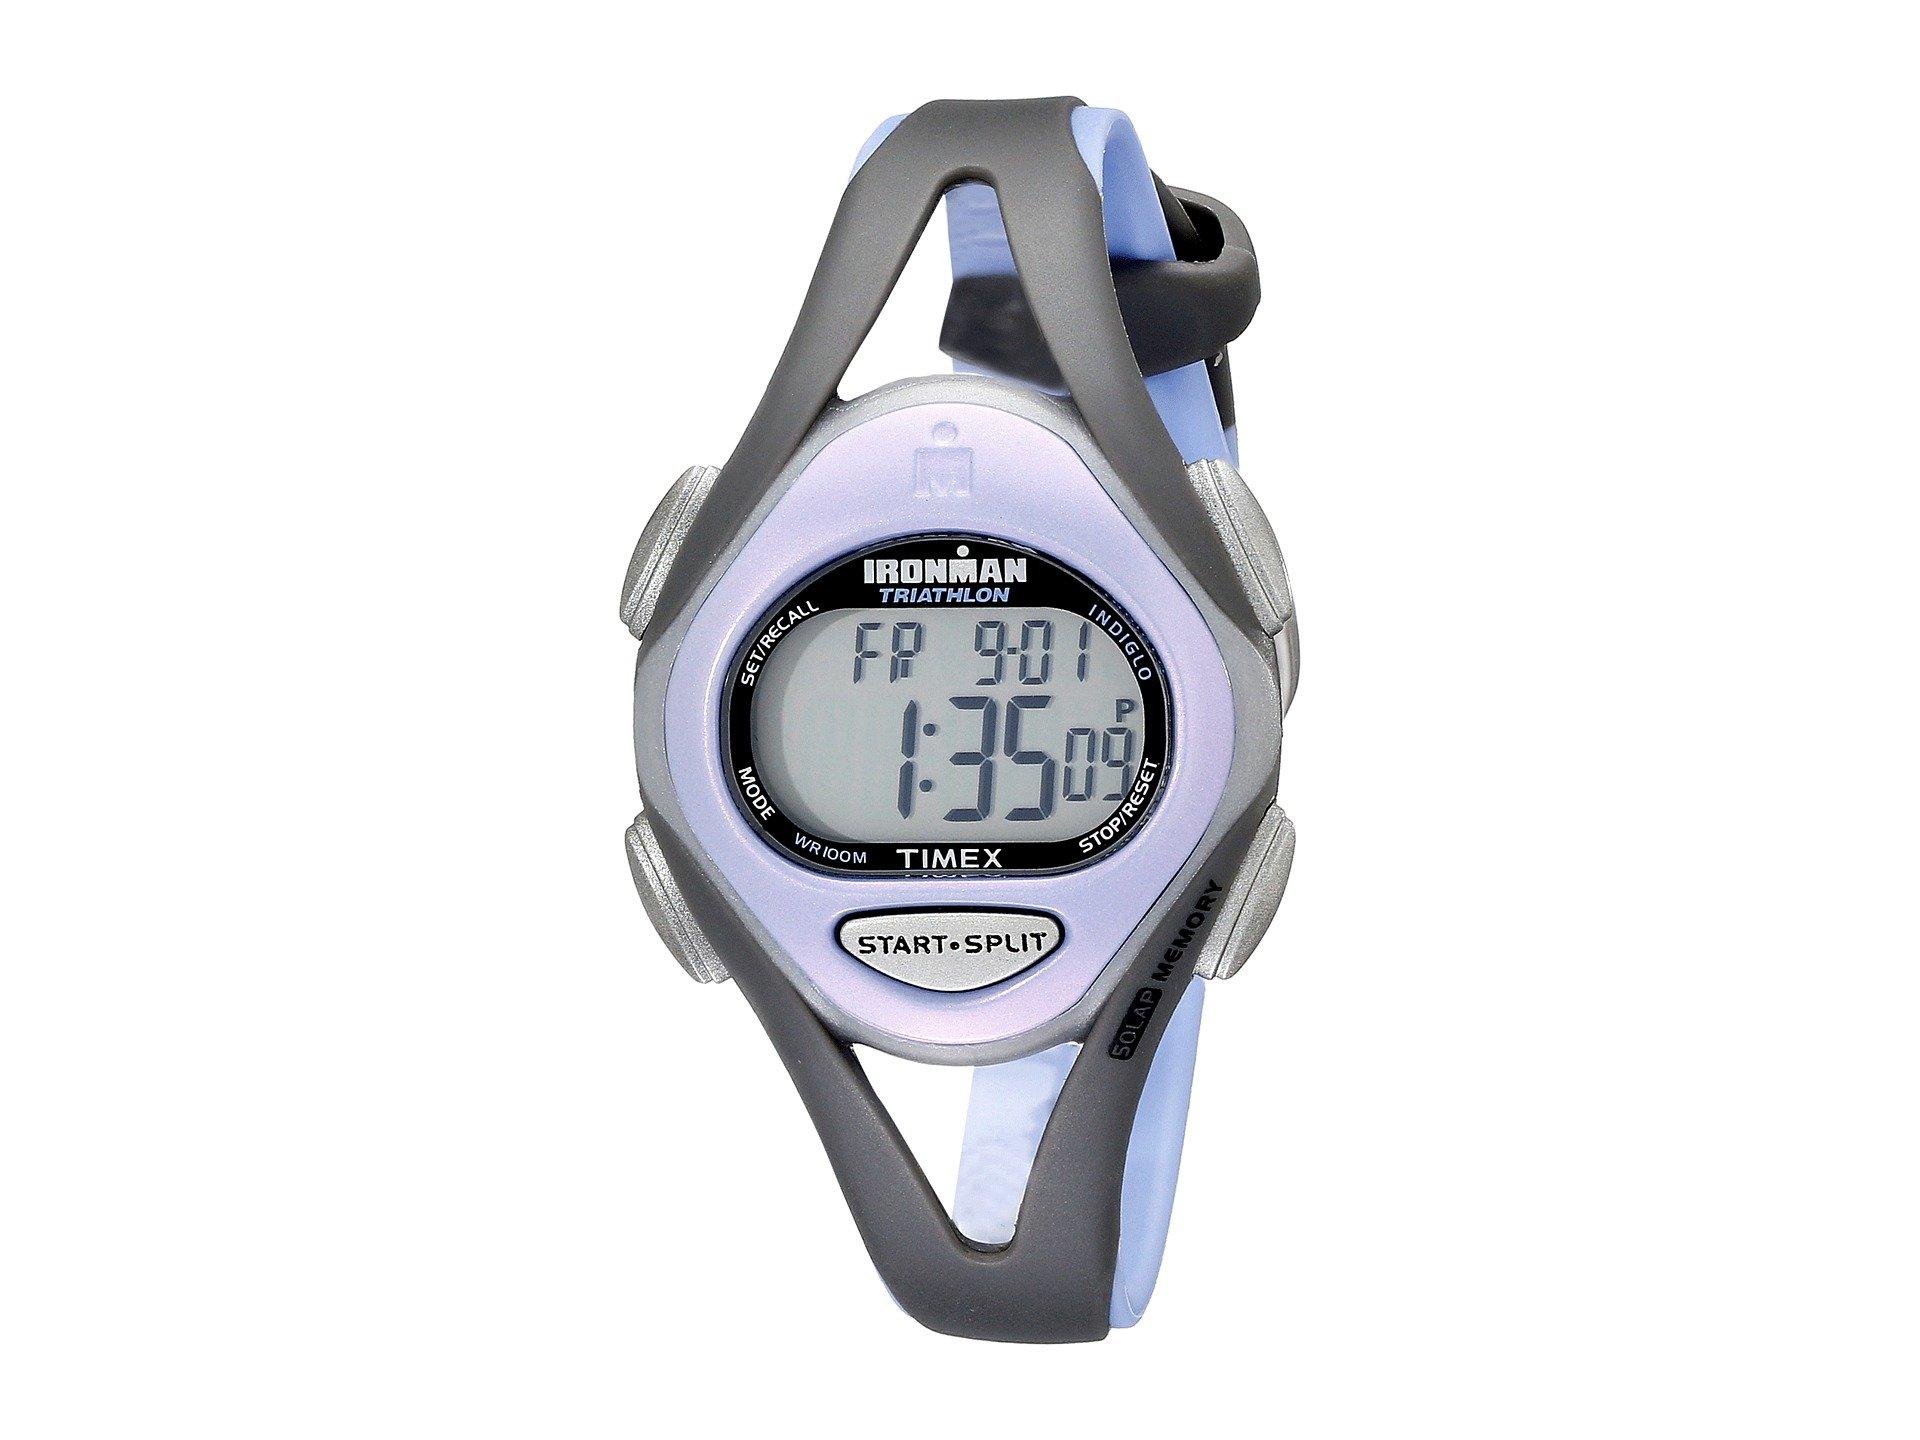 Reloj para Hombre Timex Ironman 50 Lap Sleek Mid  + Timex en VeoyCompro.net